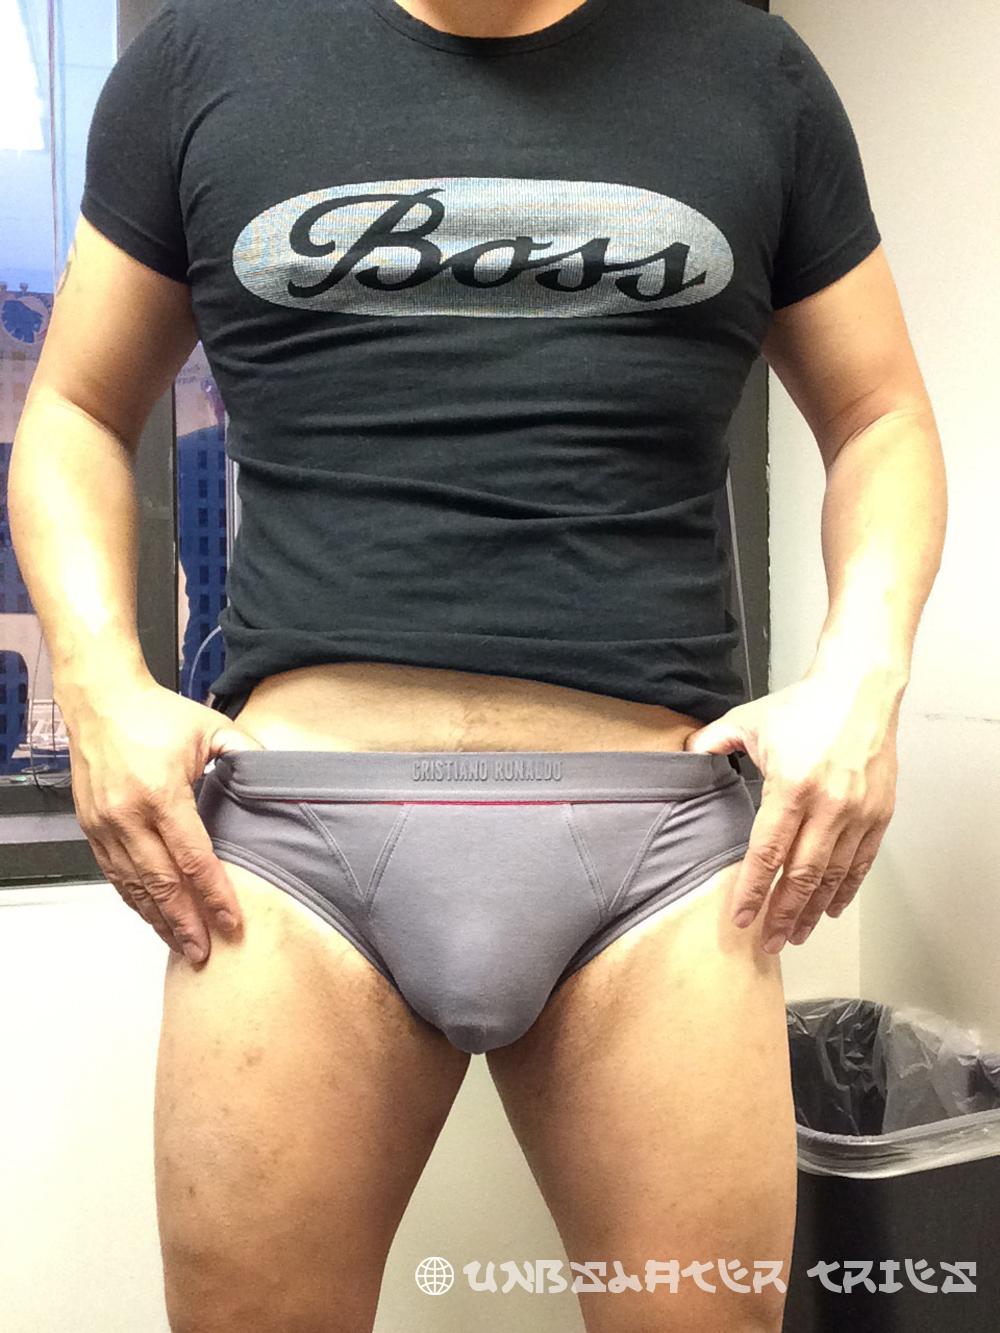 UNB Slater tries CR7 Underwear